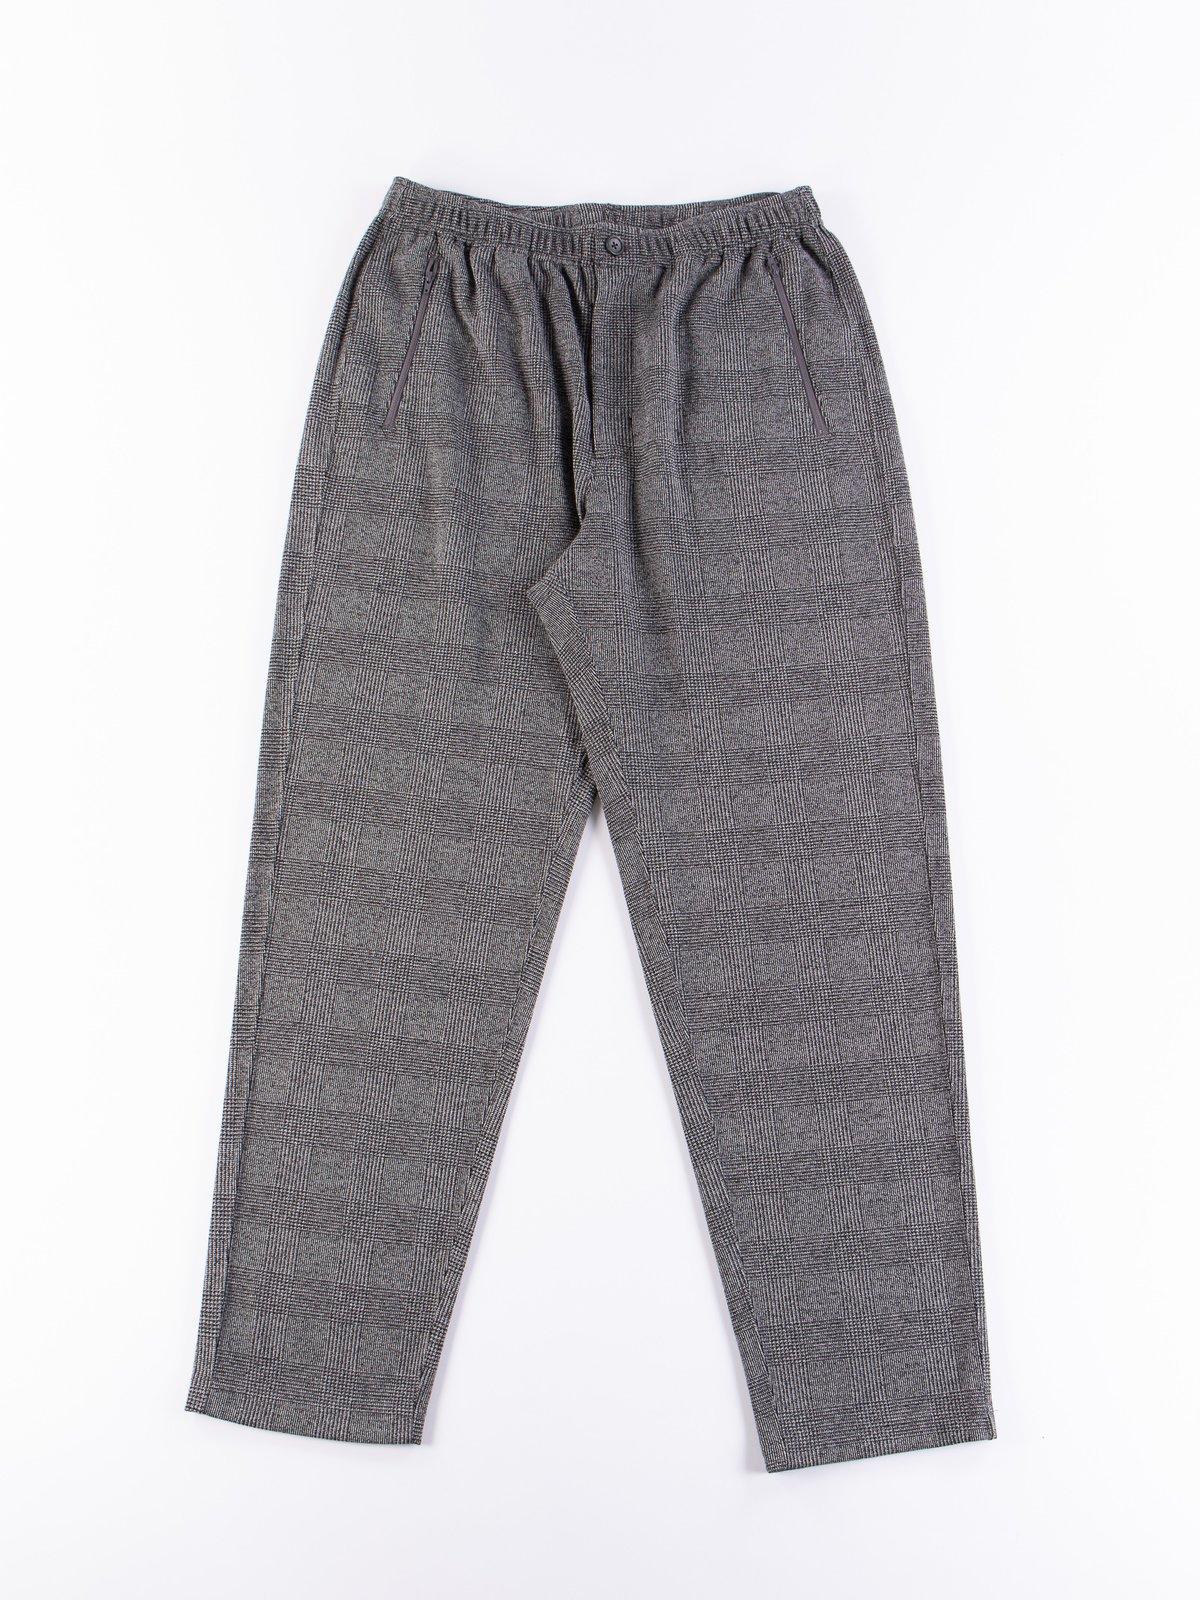 Grey PC Knit Glen Plaid Jog Pant - Image 1